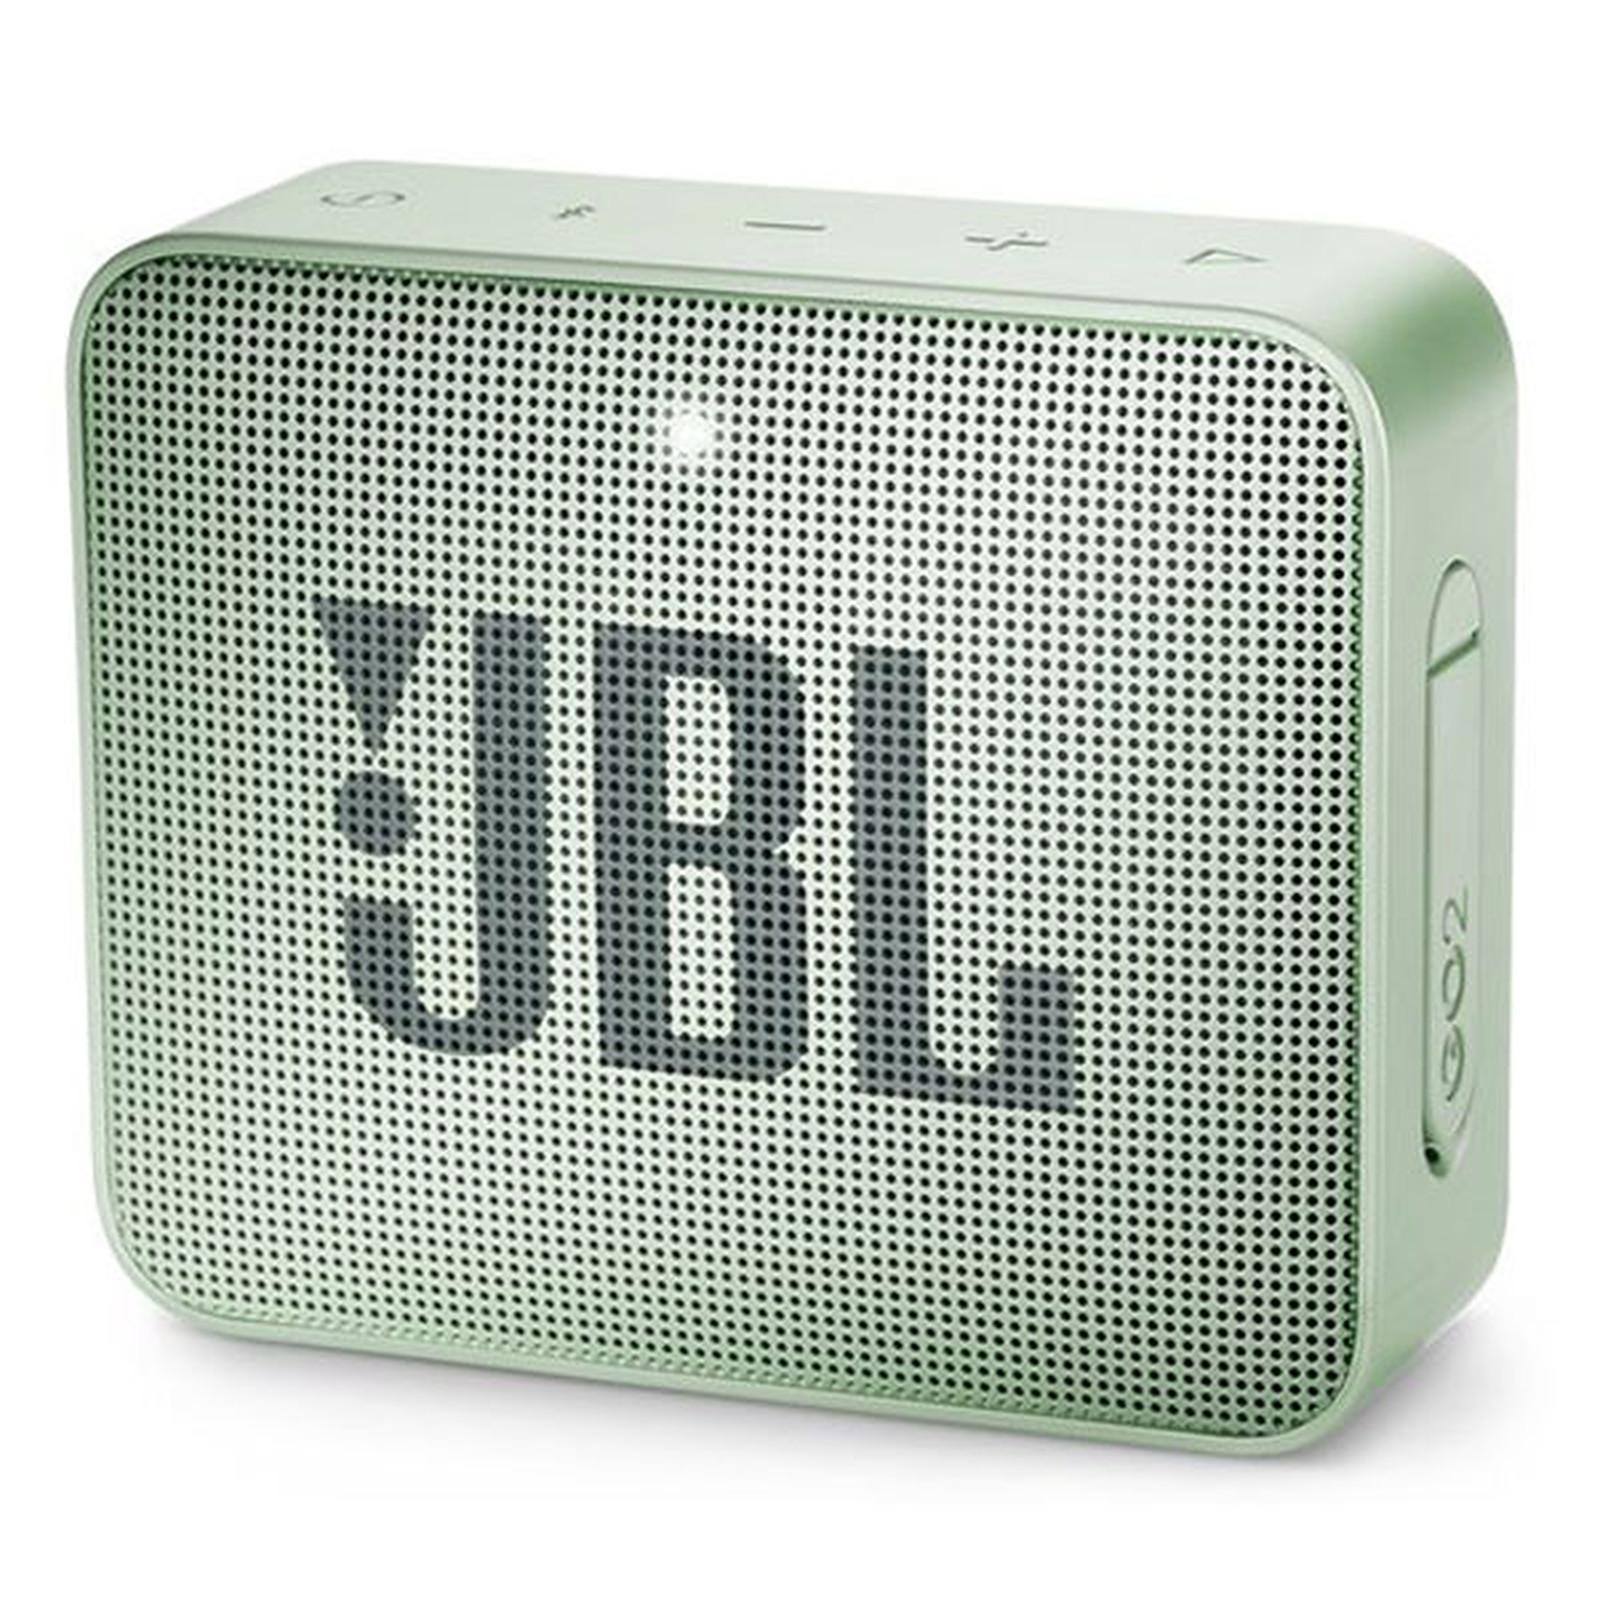 JBL GO 2 Menthe